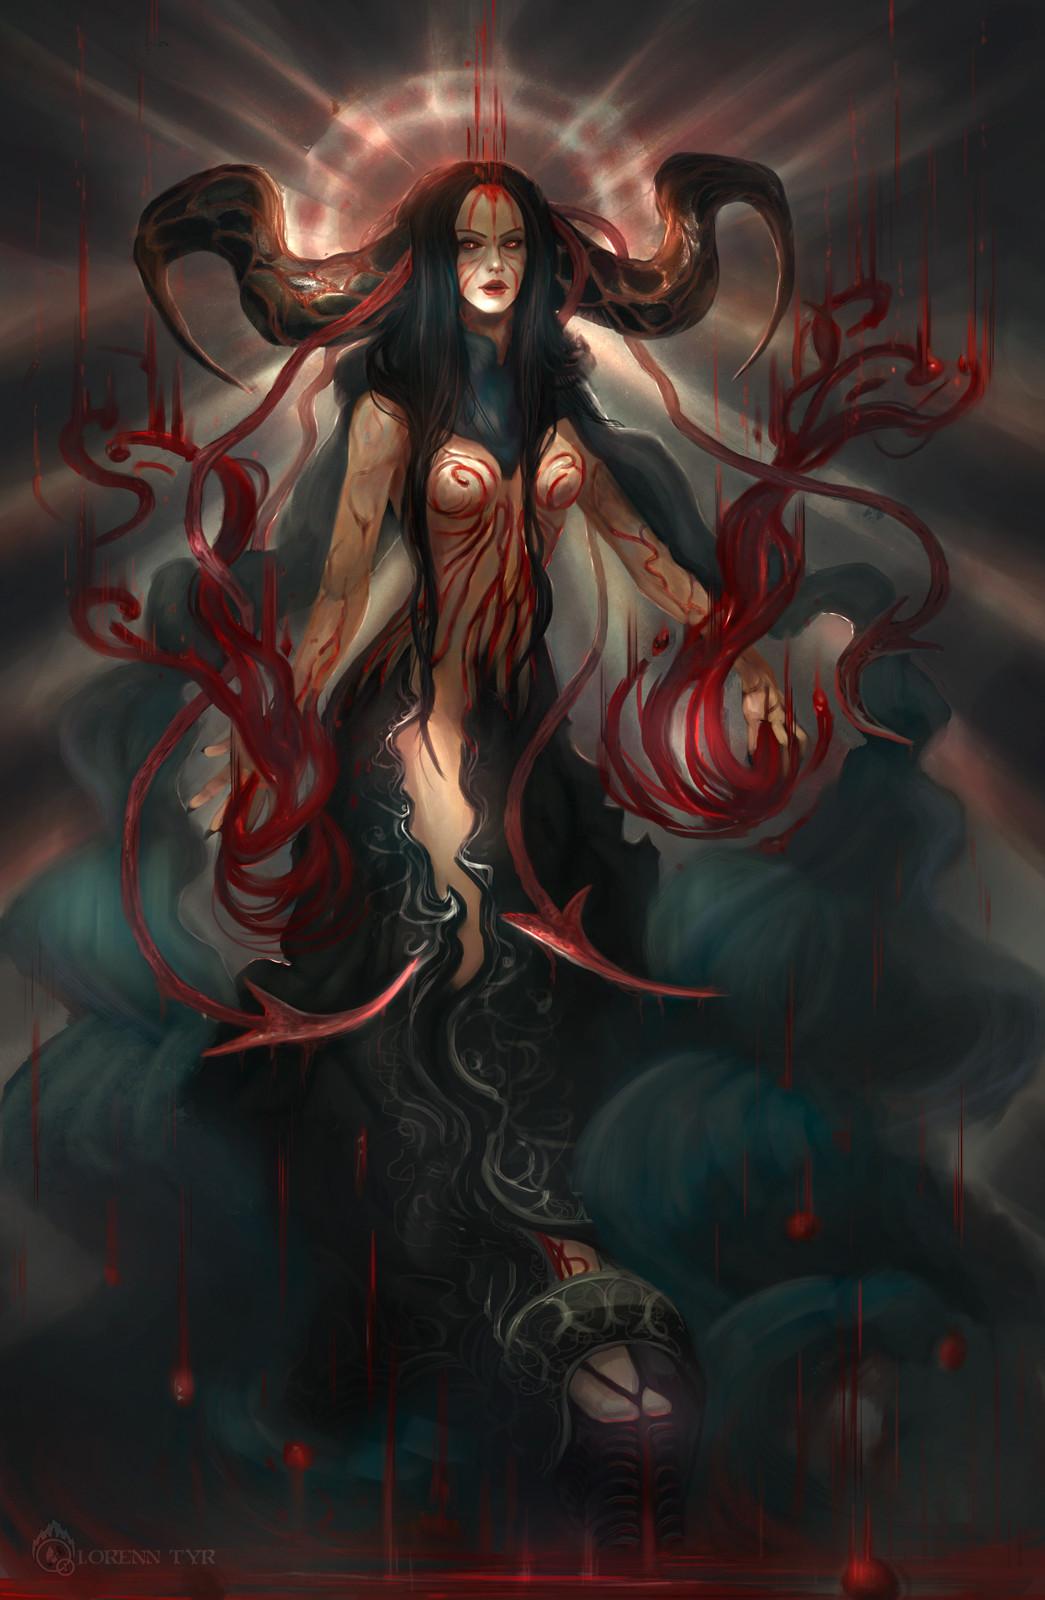 Lorenn tyr blood demon